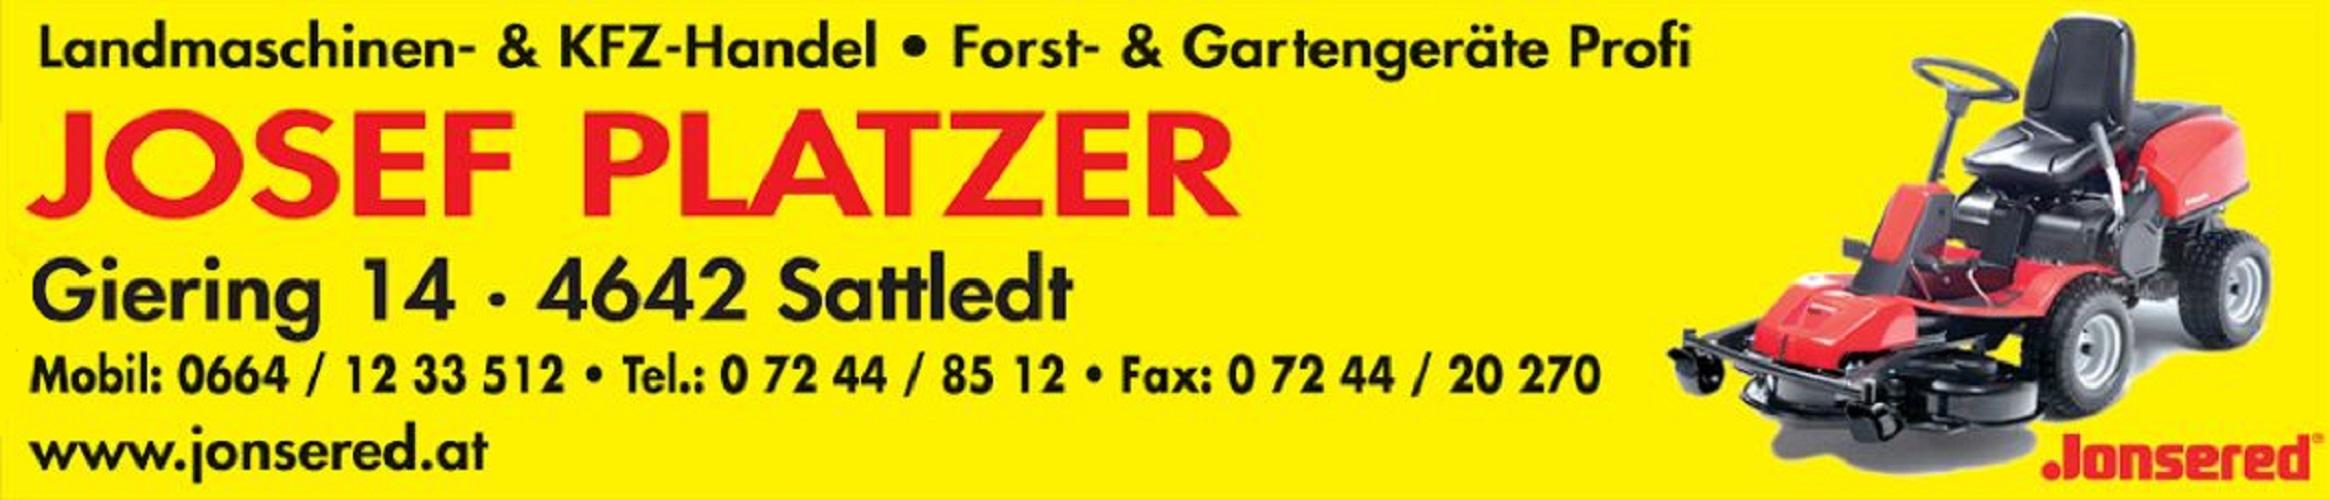 Josef Platzer - KFZ Landtechnik